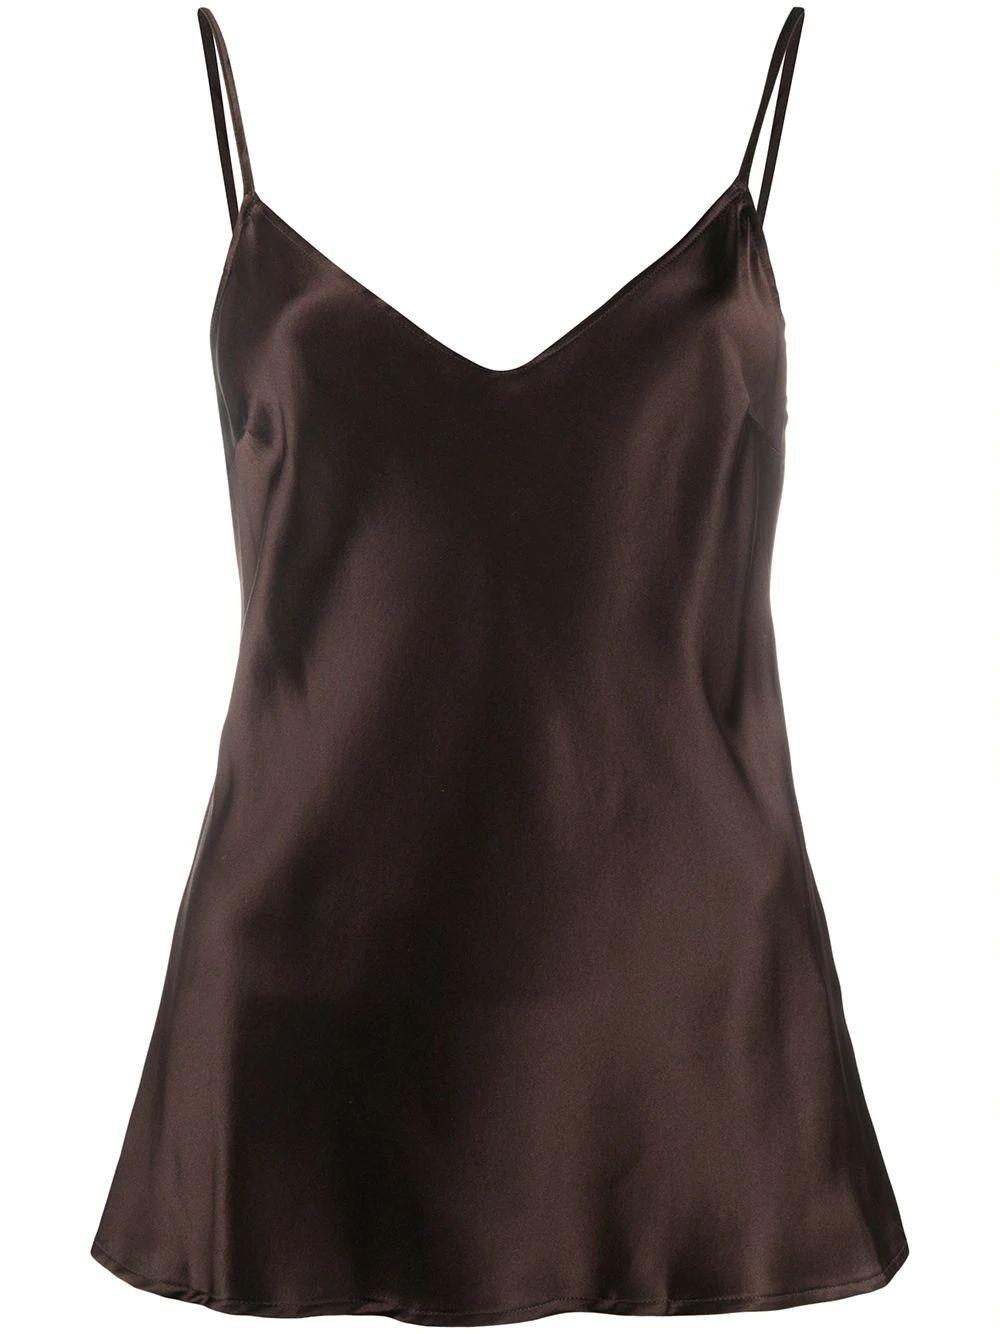 Deira Silk Slip Top Item # Q02T156-H20